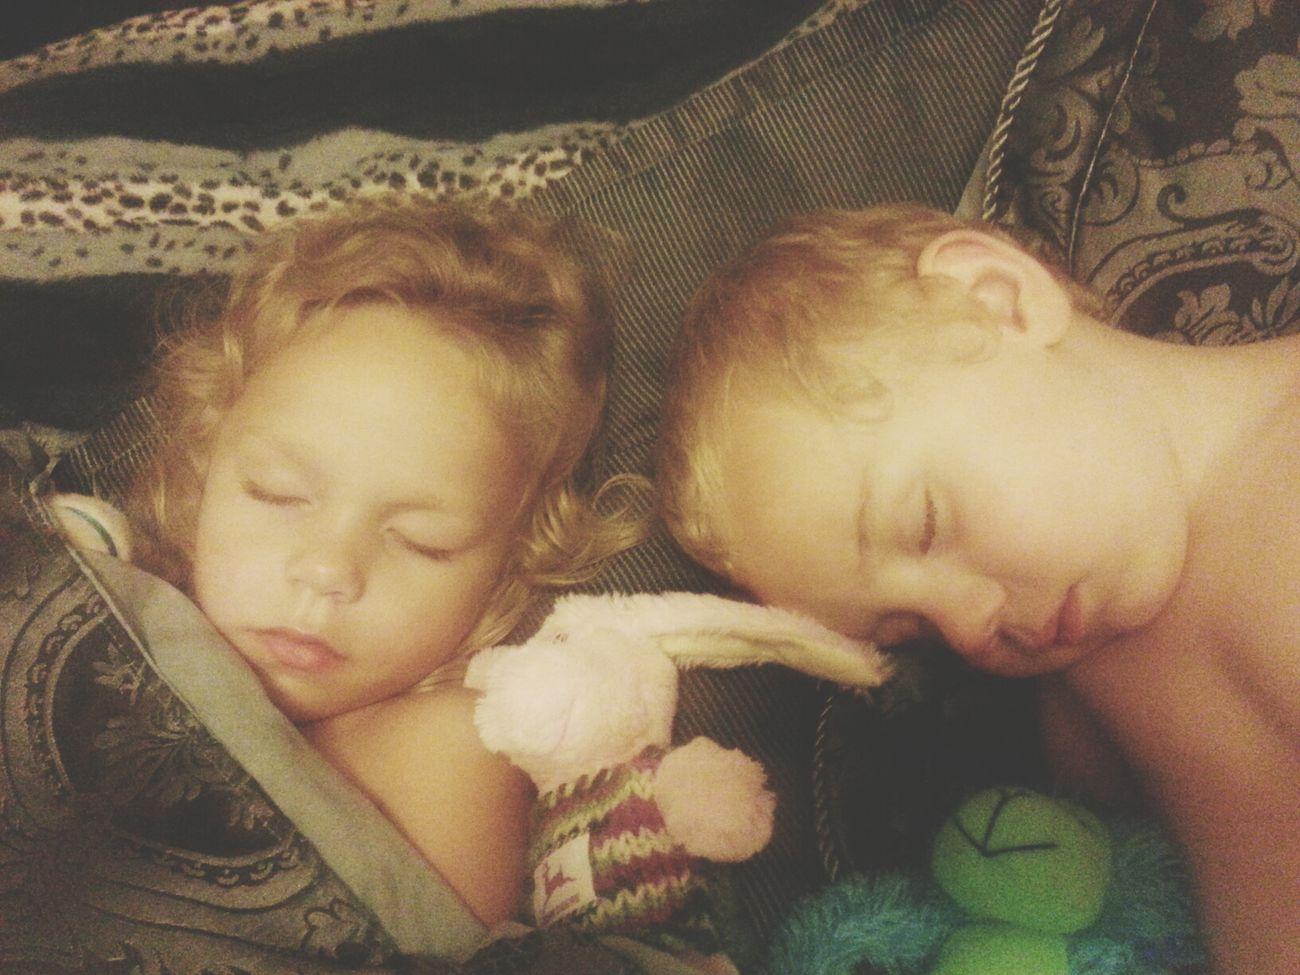 Taking Photos while 2 of my children Sleep My World ♥ My Heart ♡